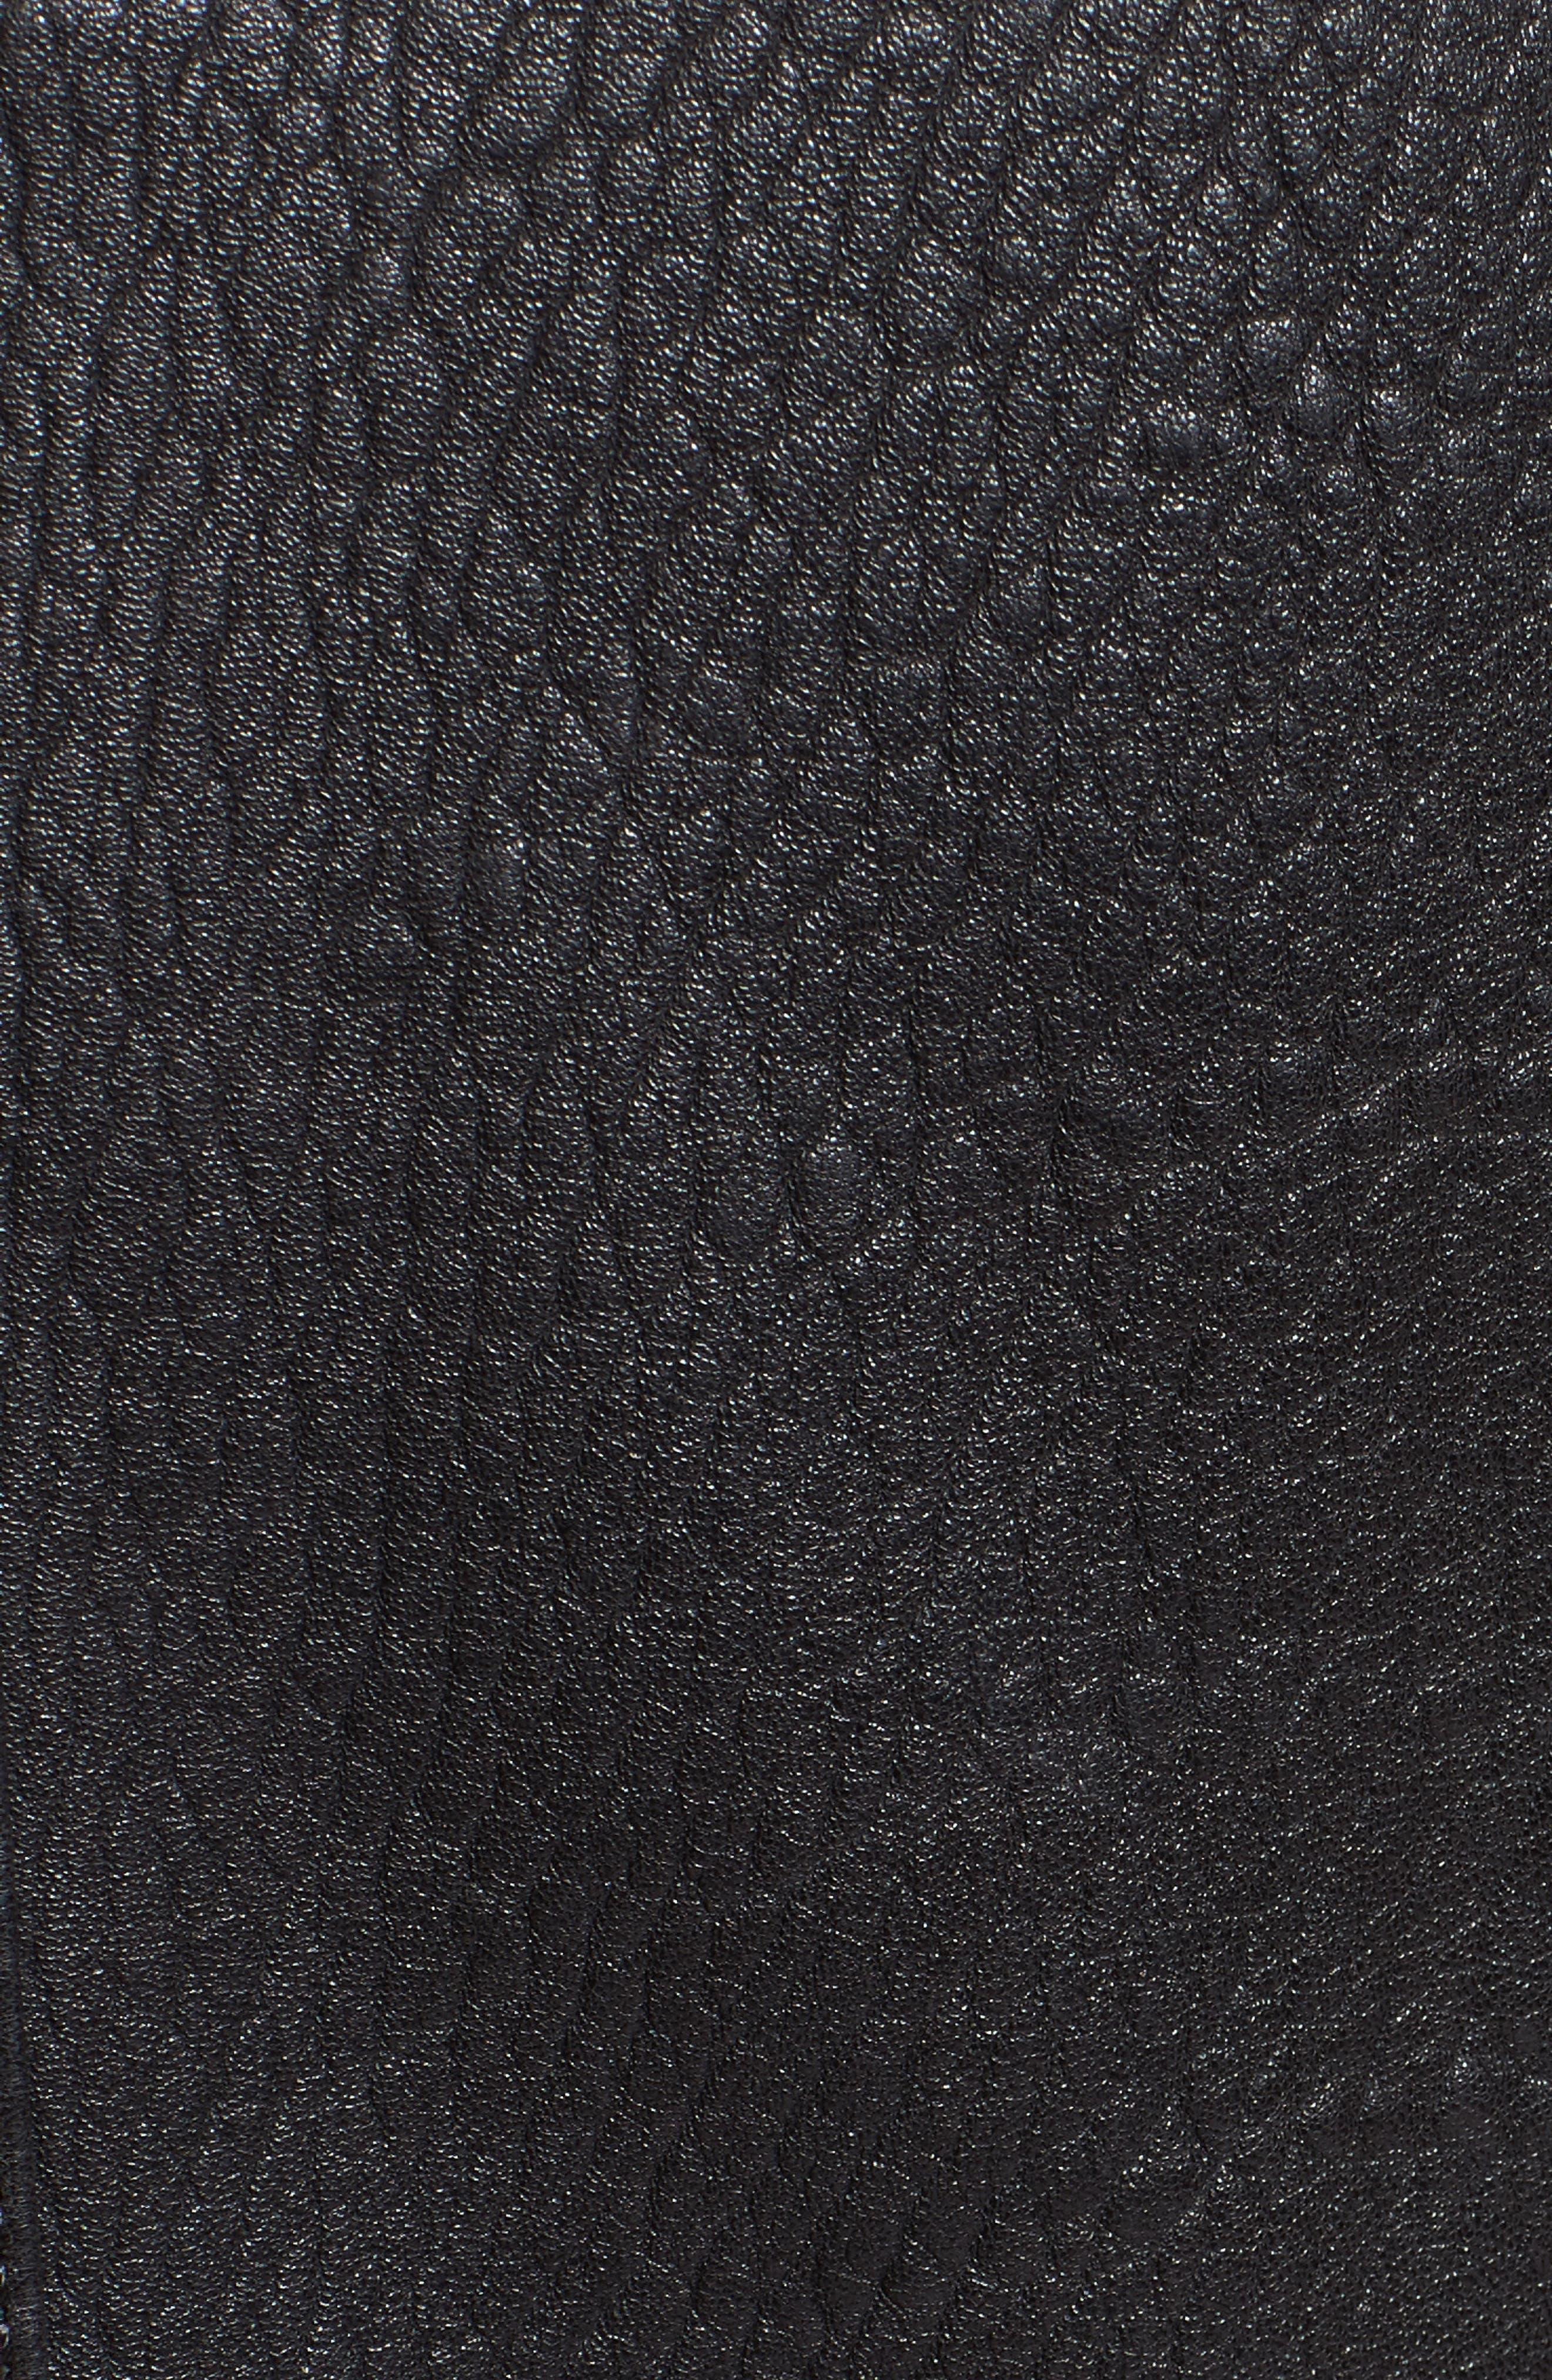 Alternate Image 3  - Proenza Schouler Pebbled Leather Moto Jacket